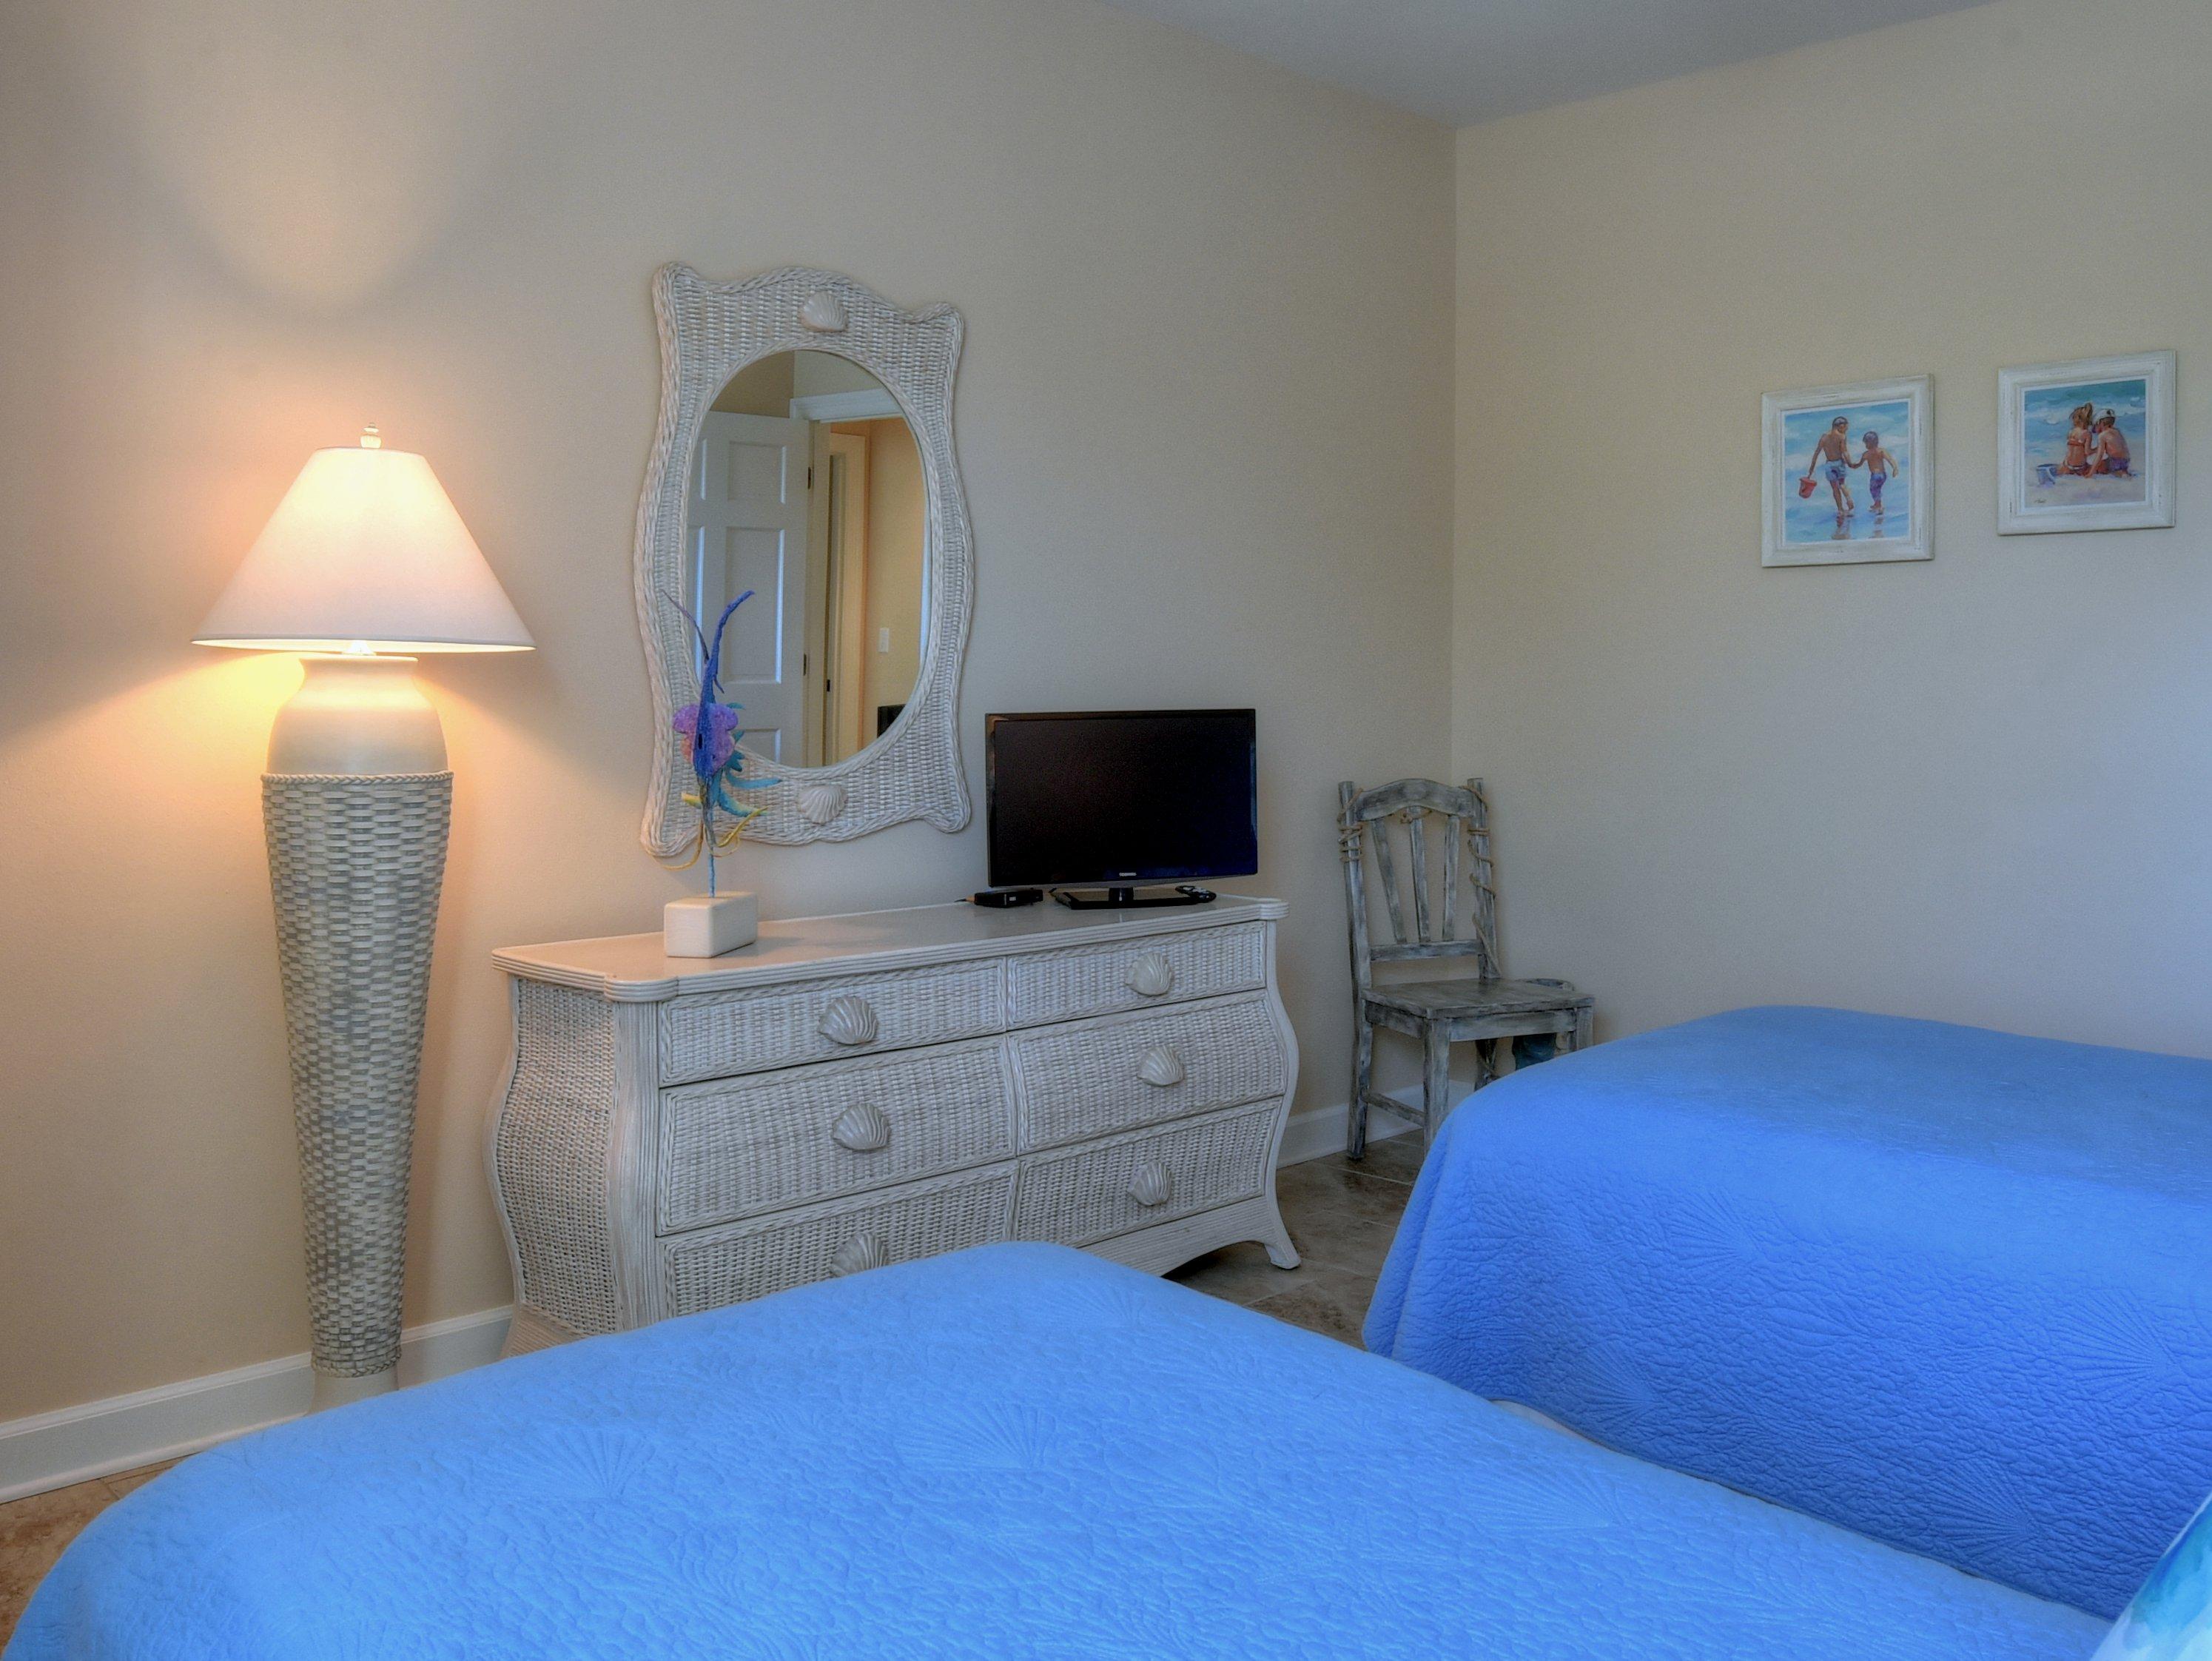 8511 Turnberry Condo rental in Sandestin Rentals ~ Cottages and Villas  in Destin Florida - #23